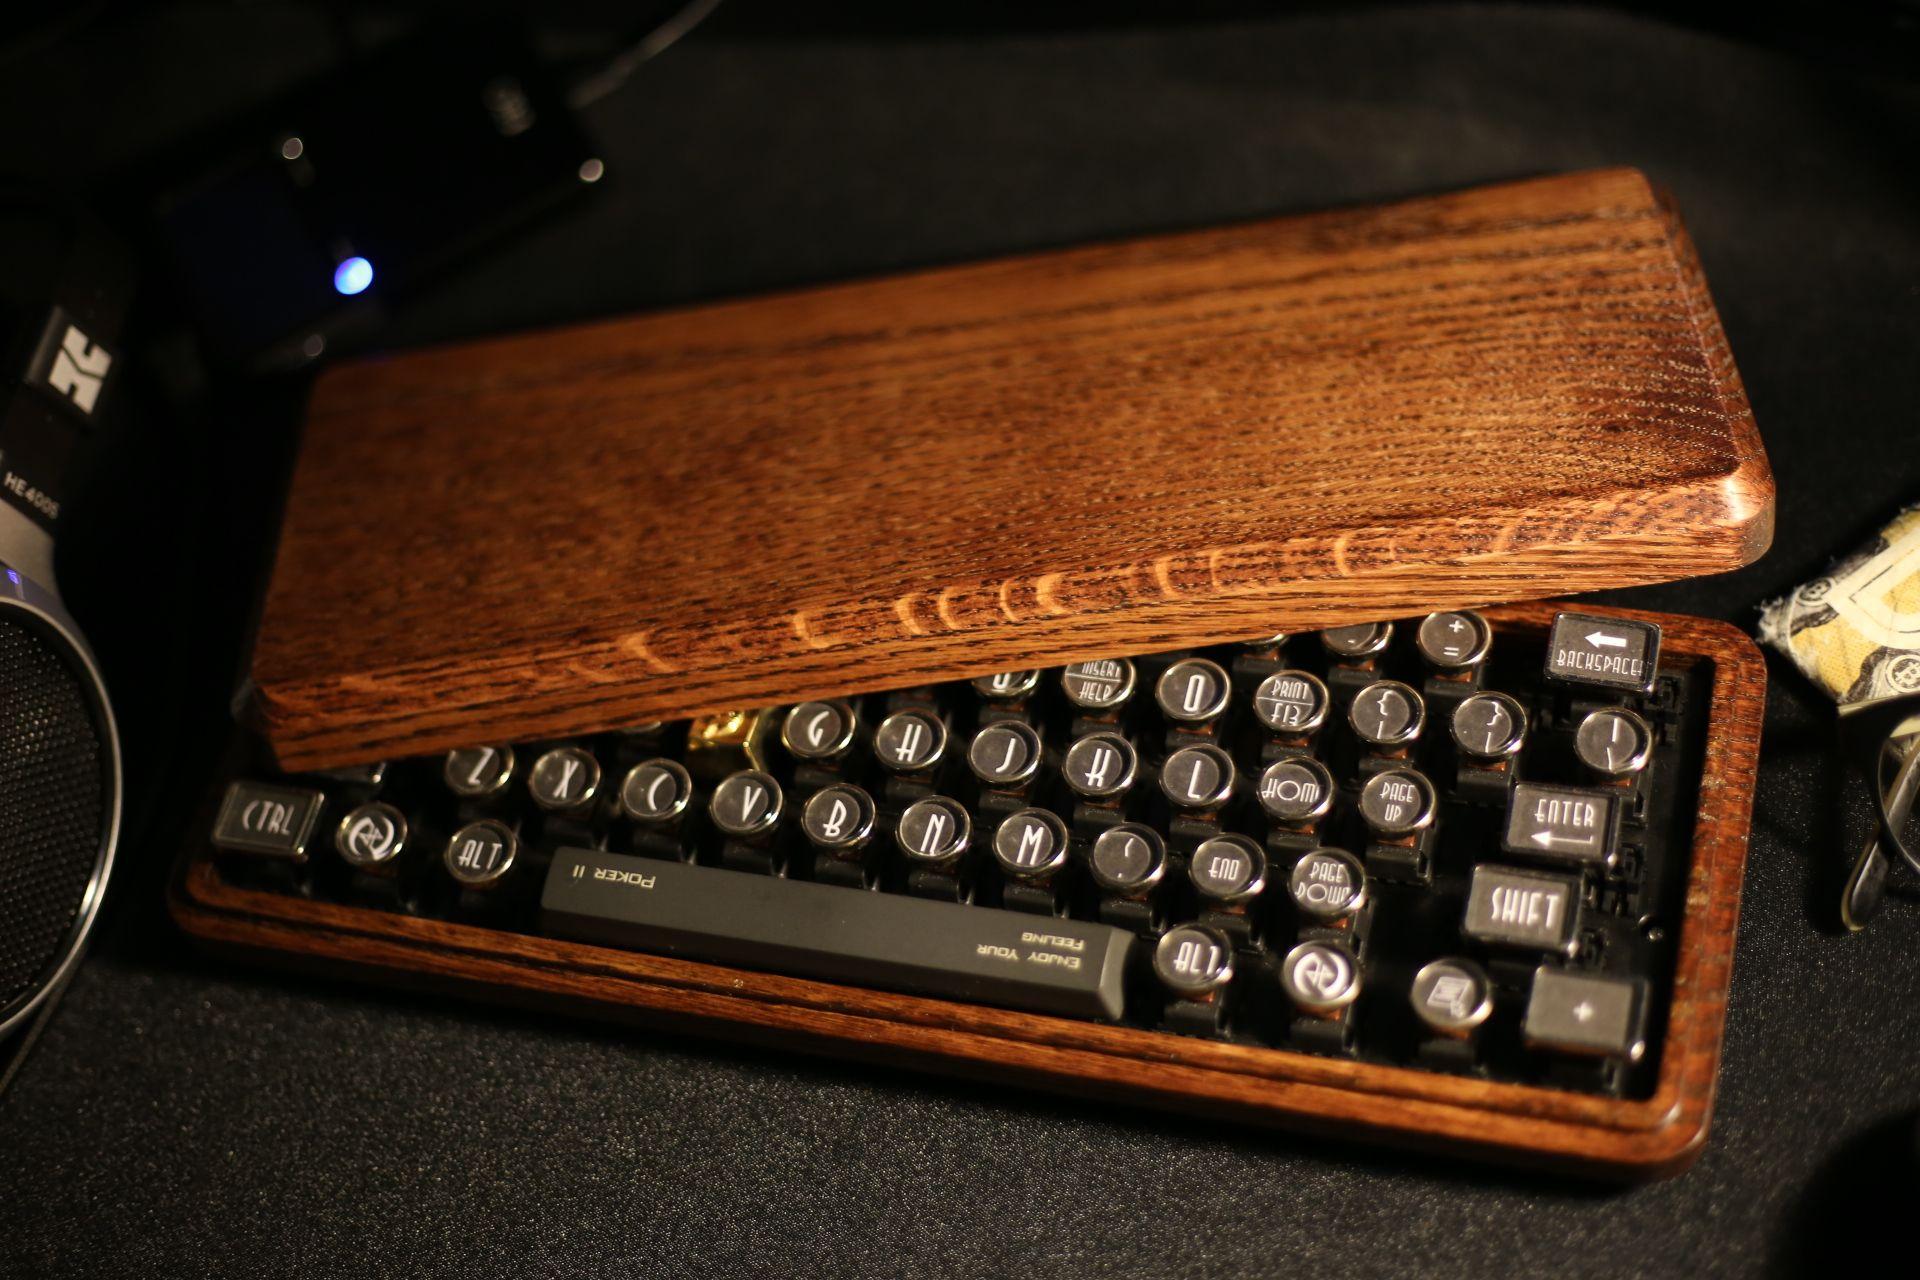 datamancer keycaps and wood case | Mechanical keyboards | Pinterest